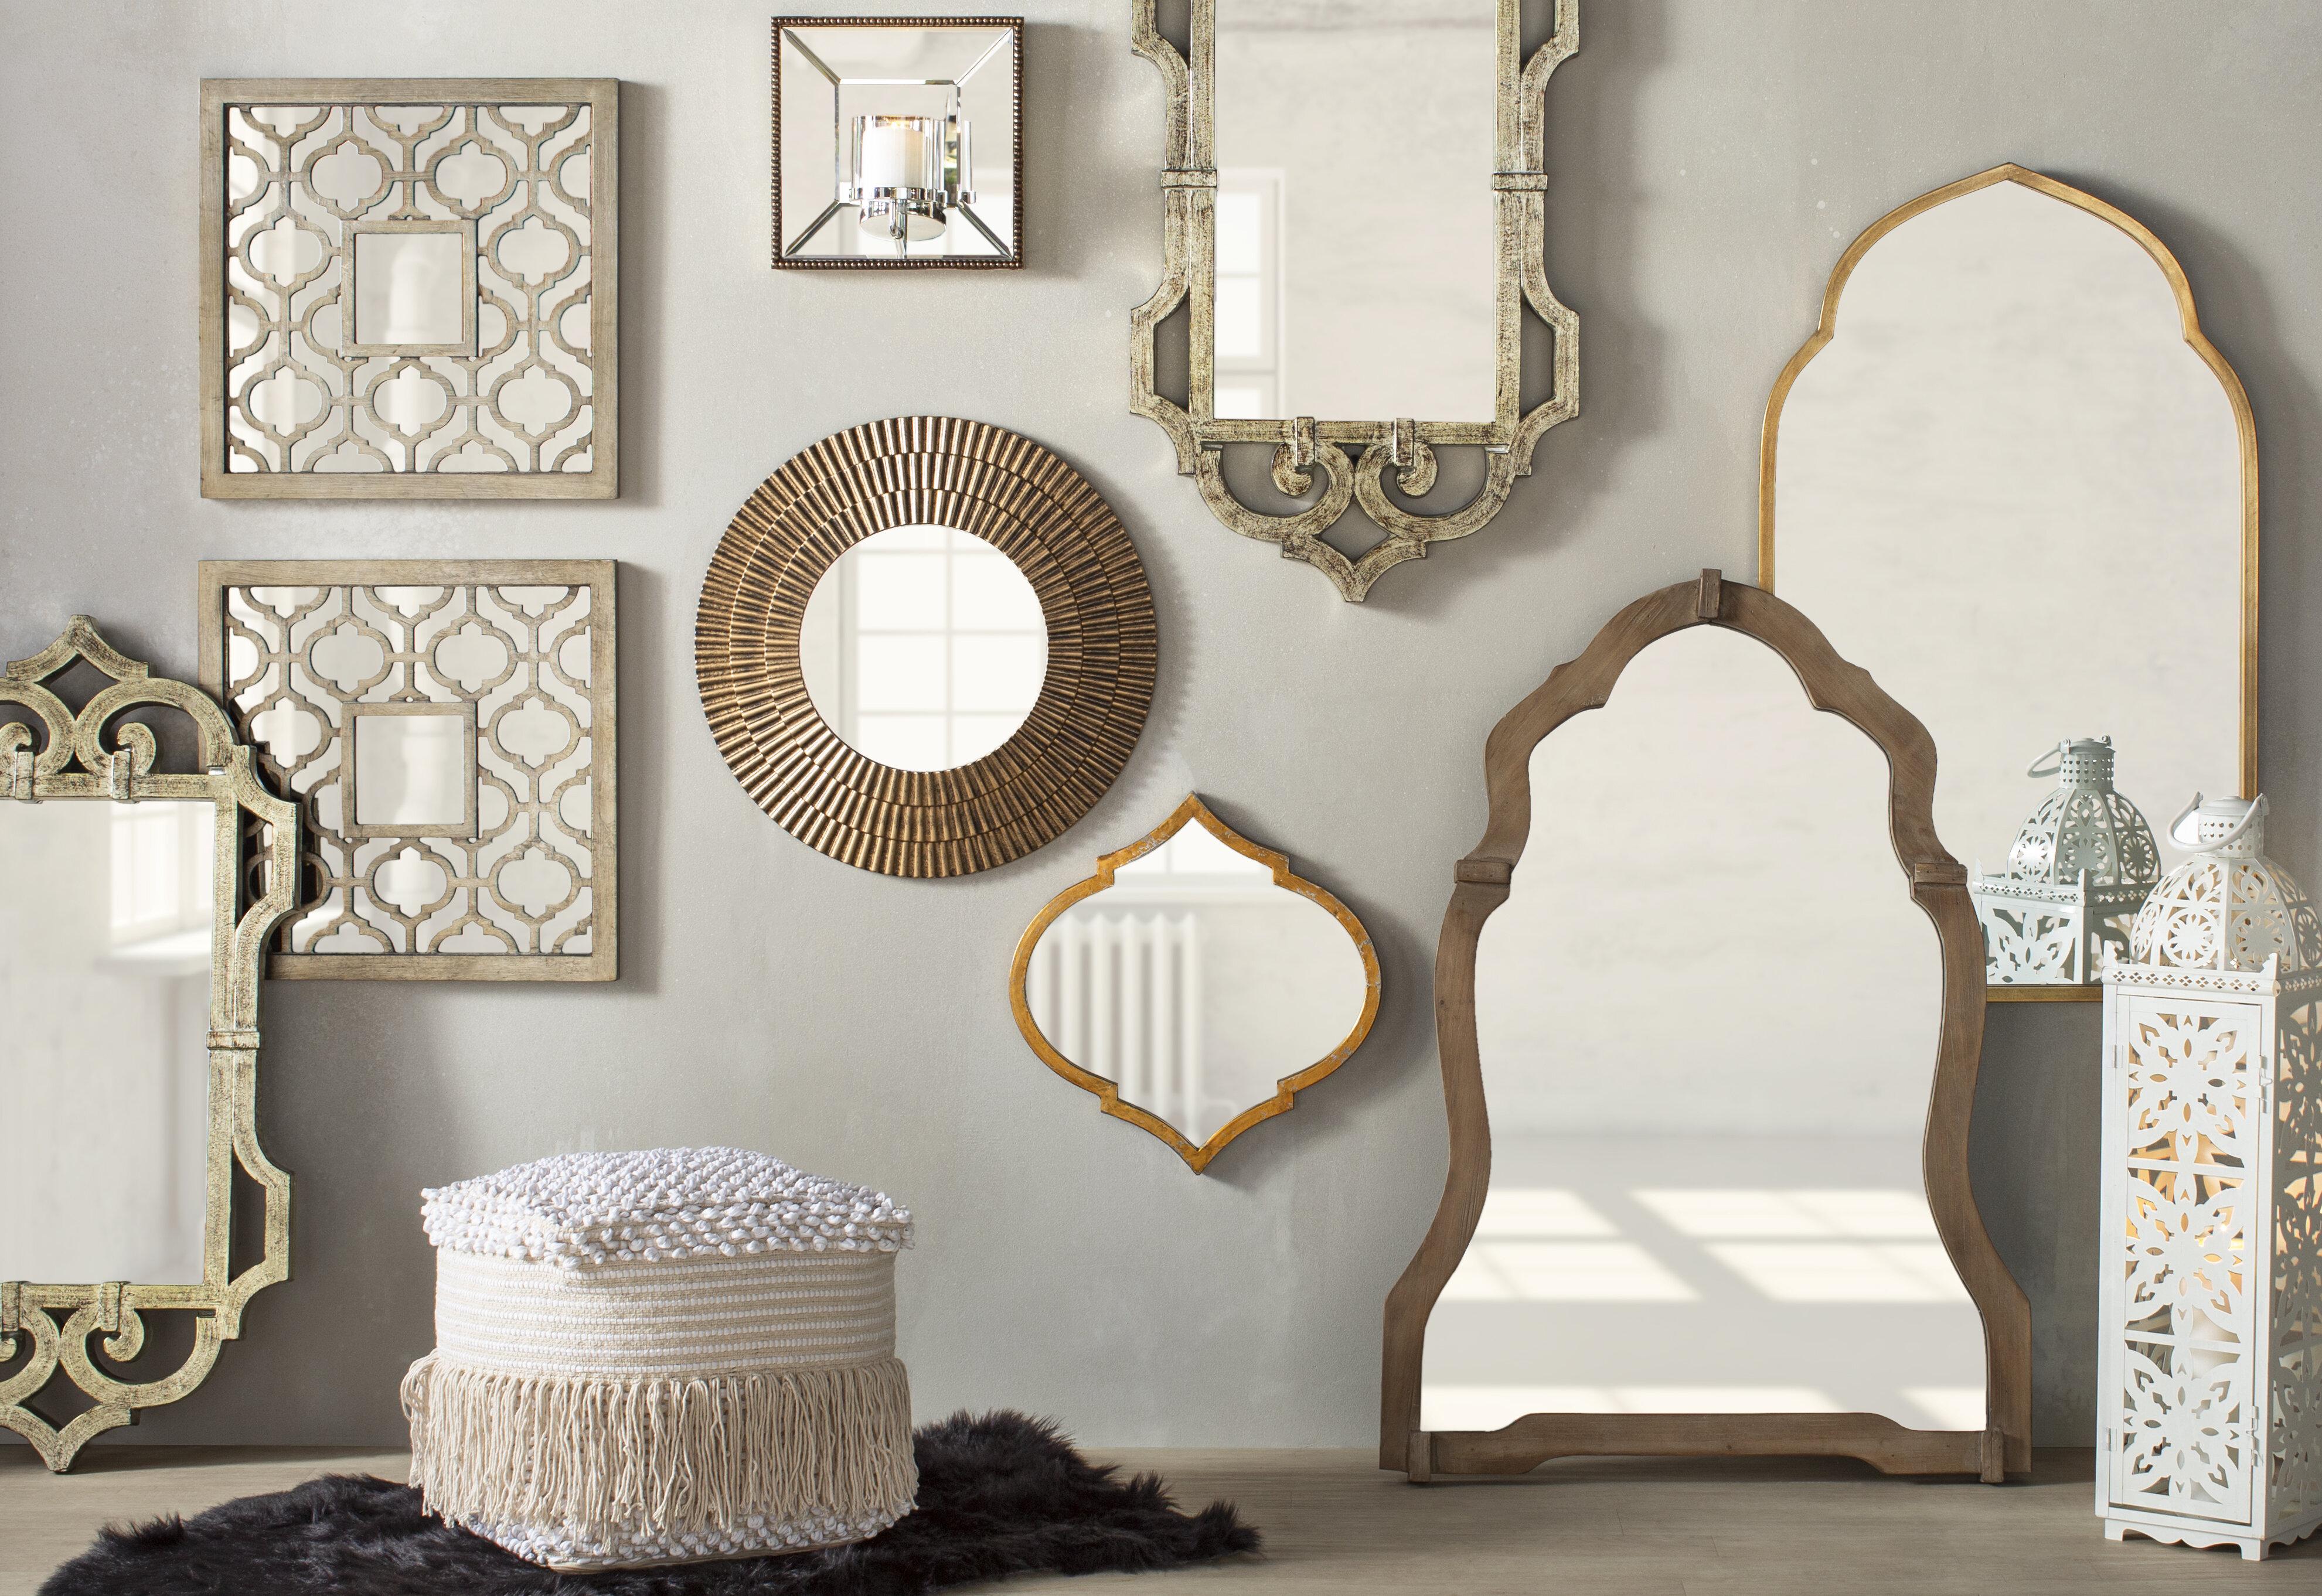 10 Dazzling Wall Mirror Decor Ideas